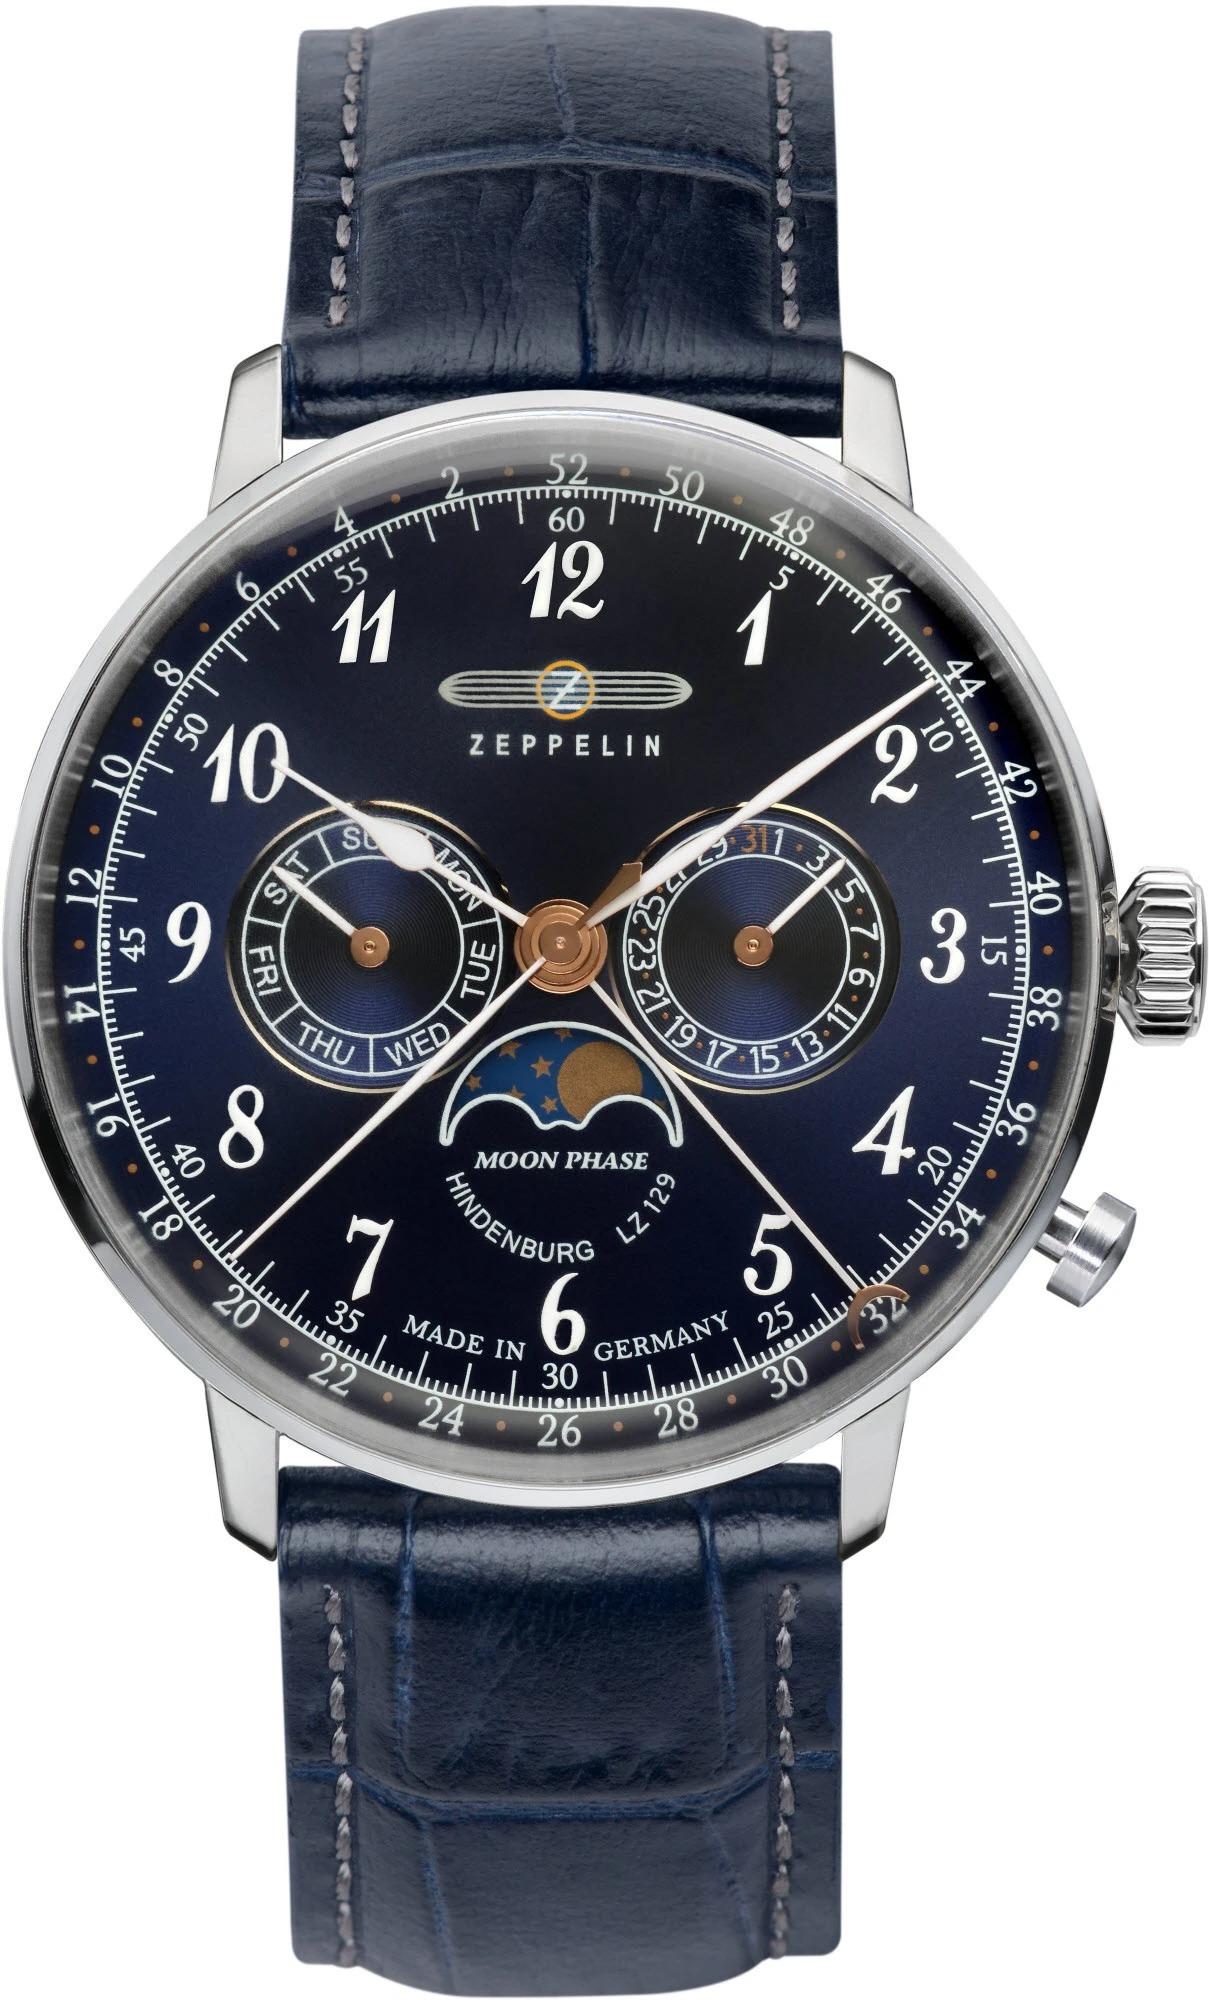 Мужские часы Zeppelin LZ129 Hindenburg Moonphase 70363